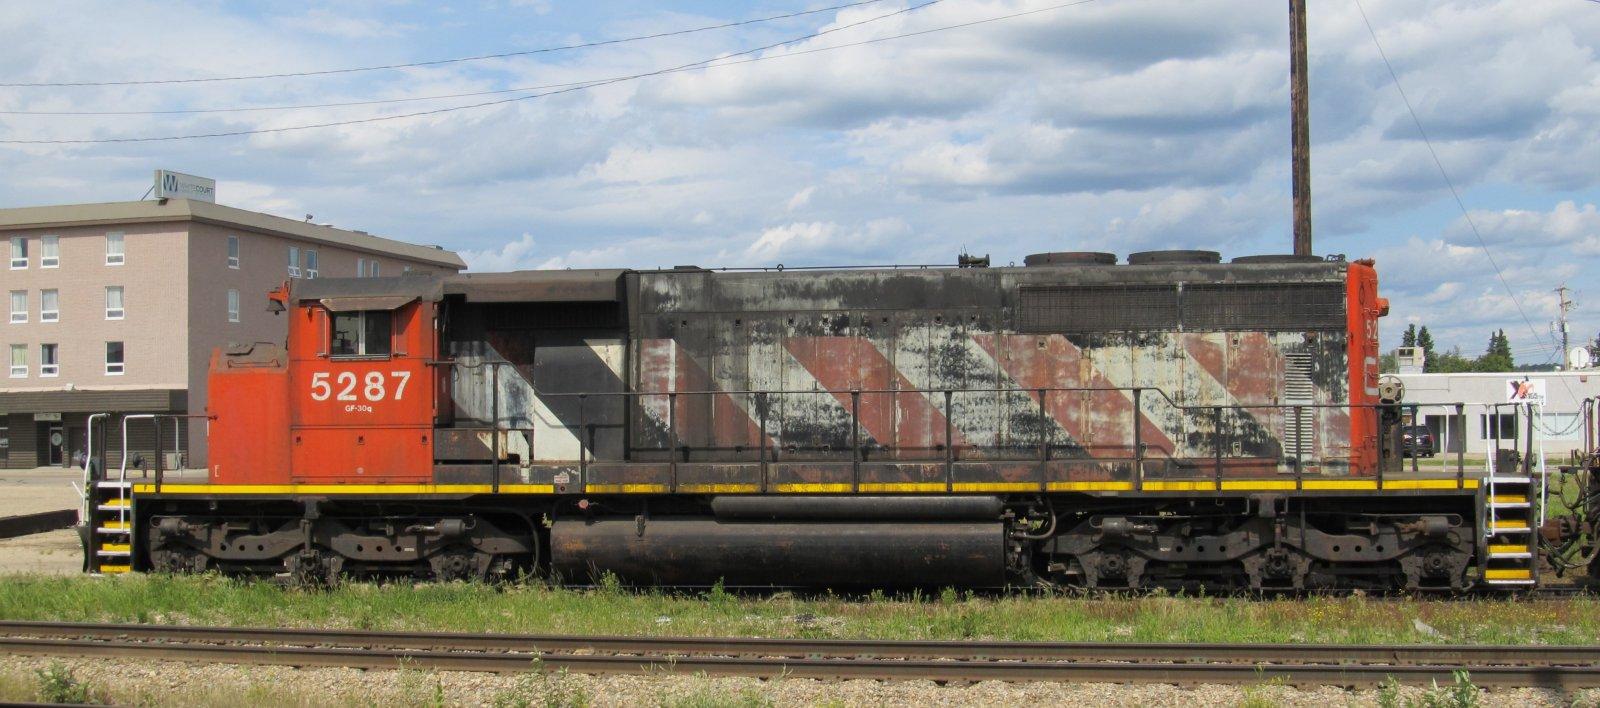 CN 5287_SD40-2W 08-11-2020 .jpg